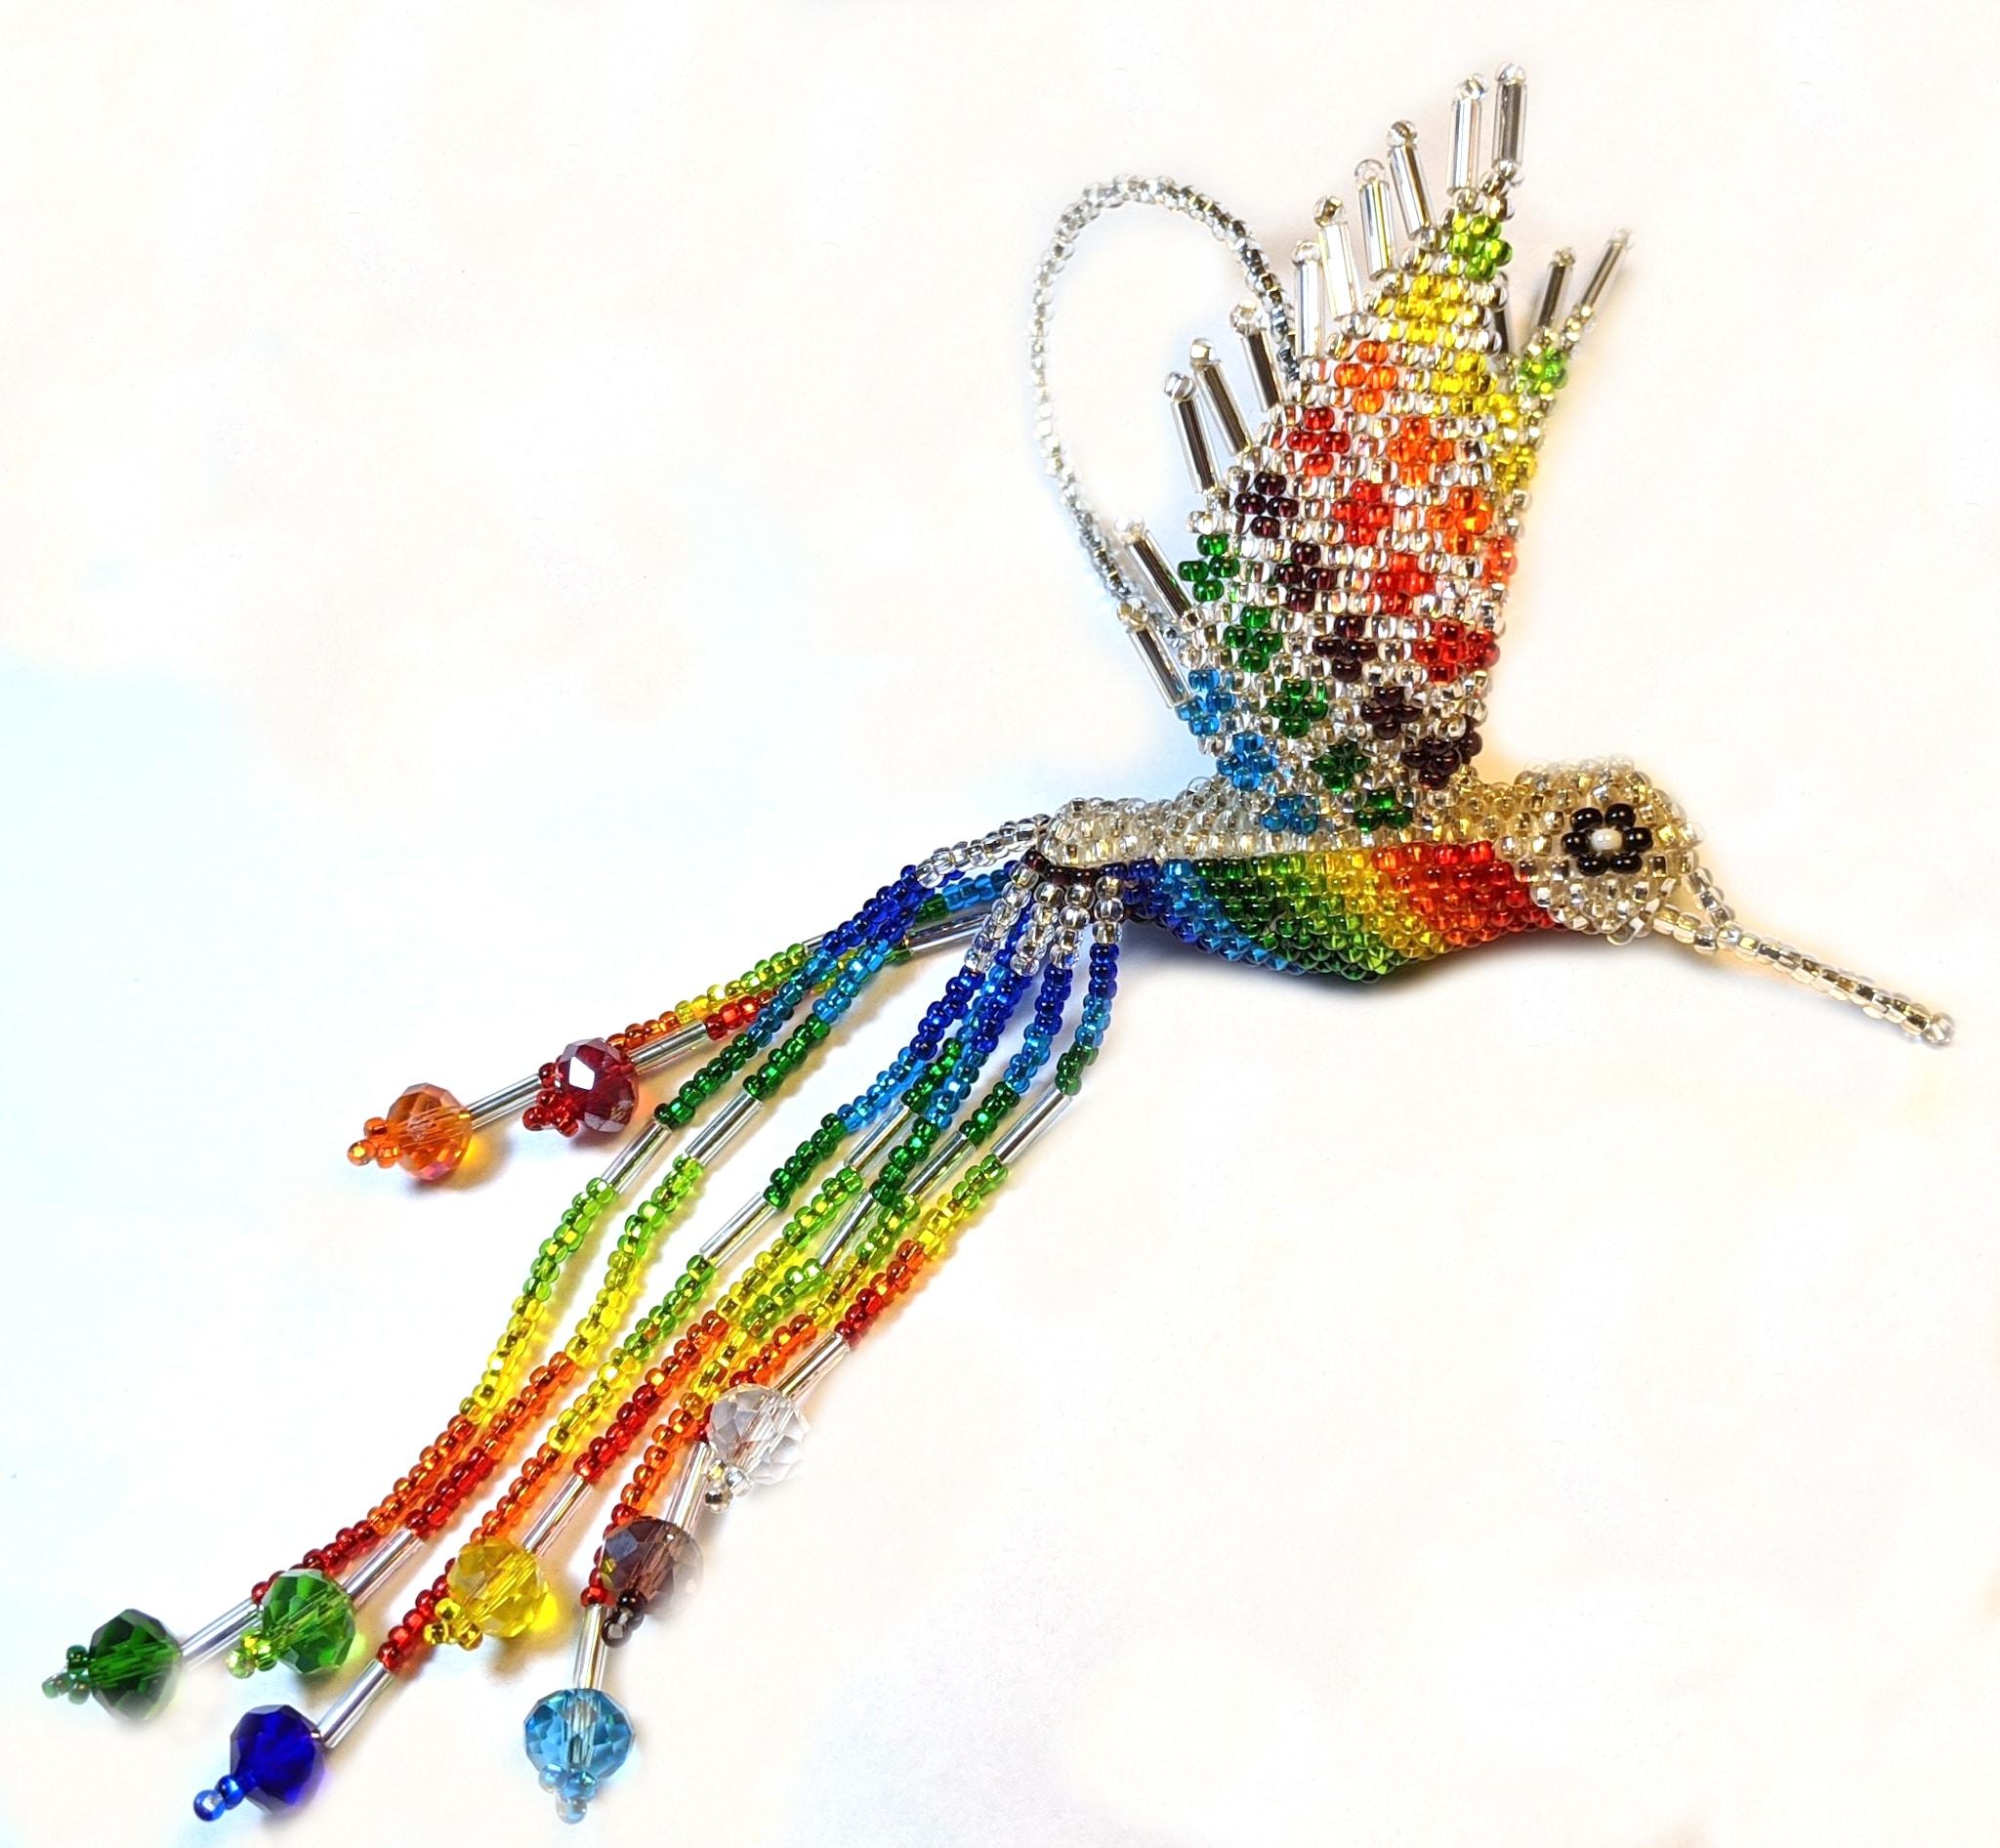 Hummingbird Beaded Ornament - Rainbow with Silver White